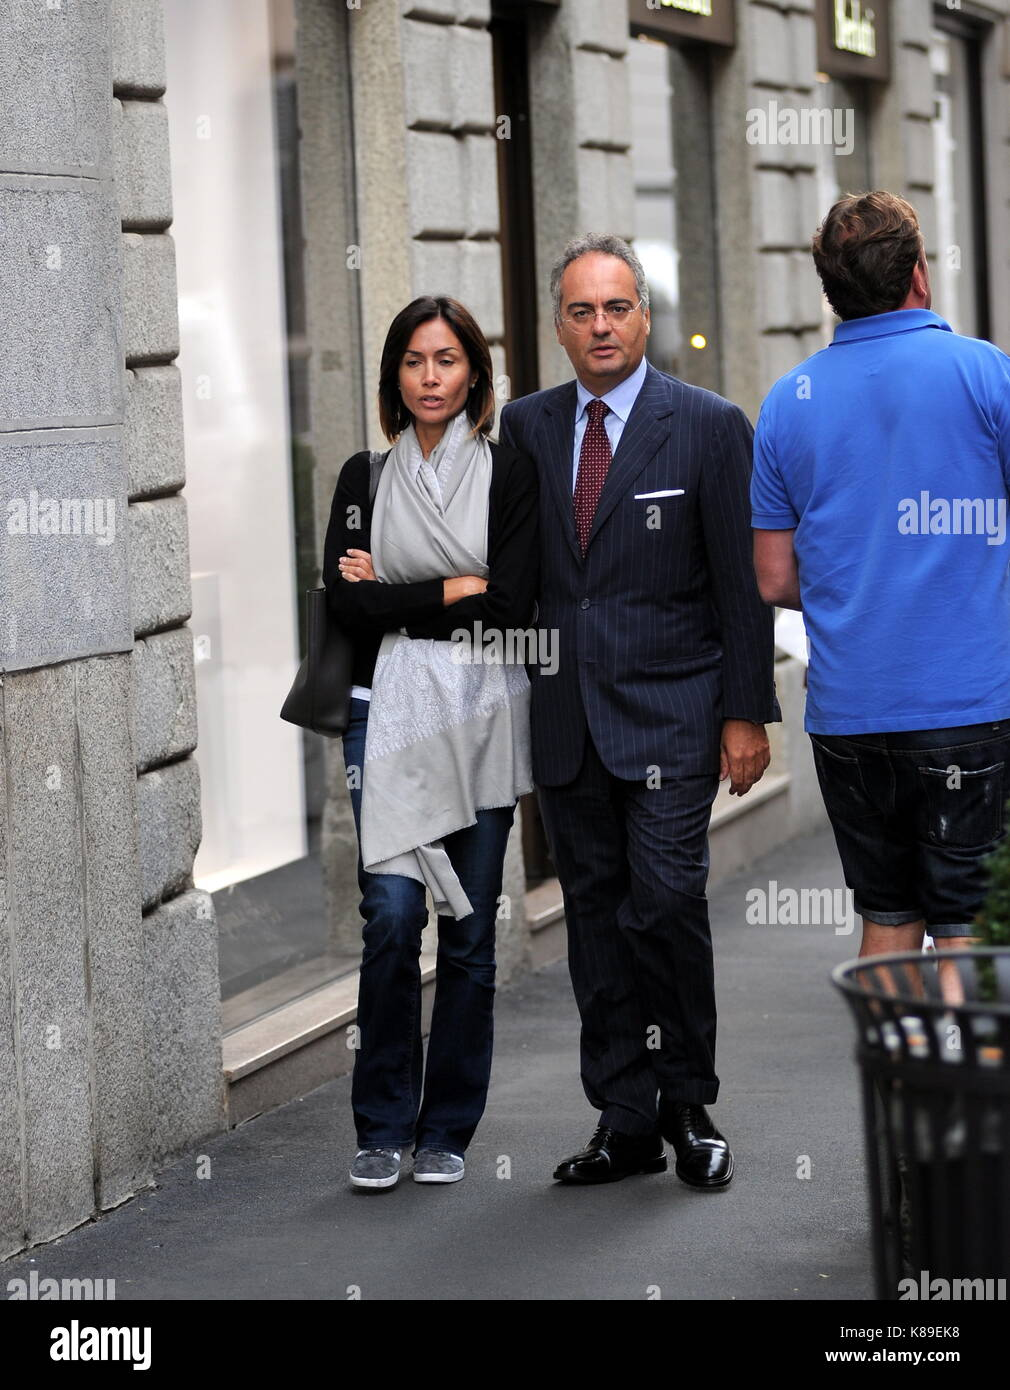 Milan, Mara Carfagna and boyfriend Alessandro Ruben romantic walk Former Minister MARA CARFAGNA surprised walking - Stock Image